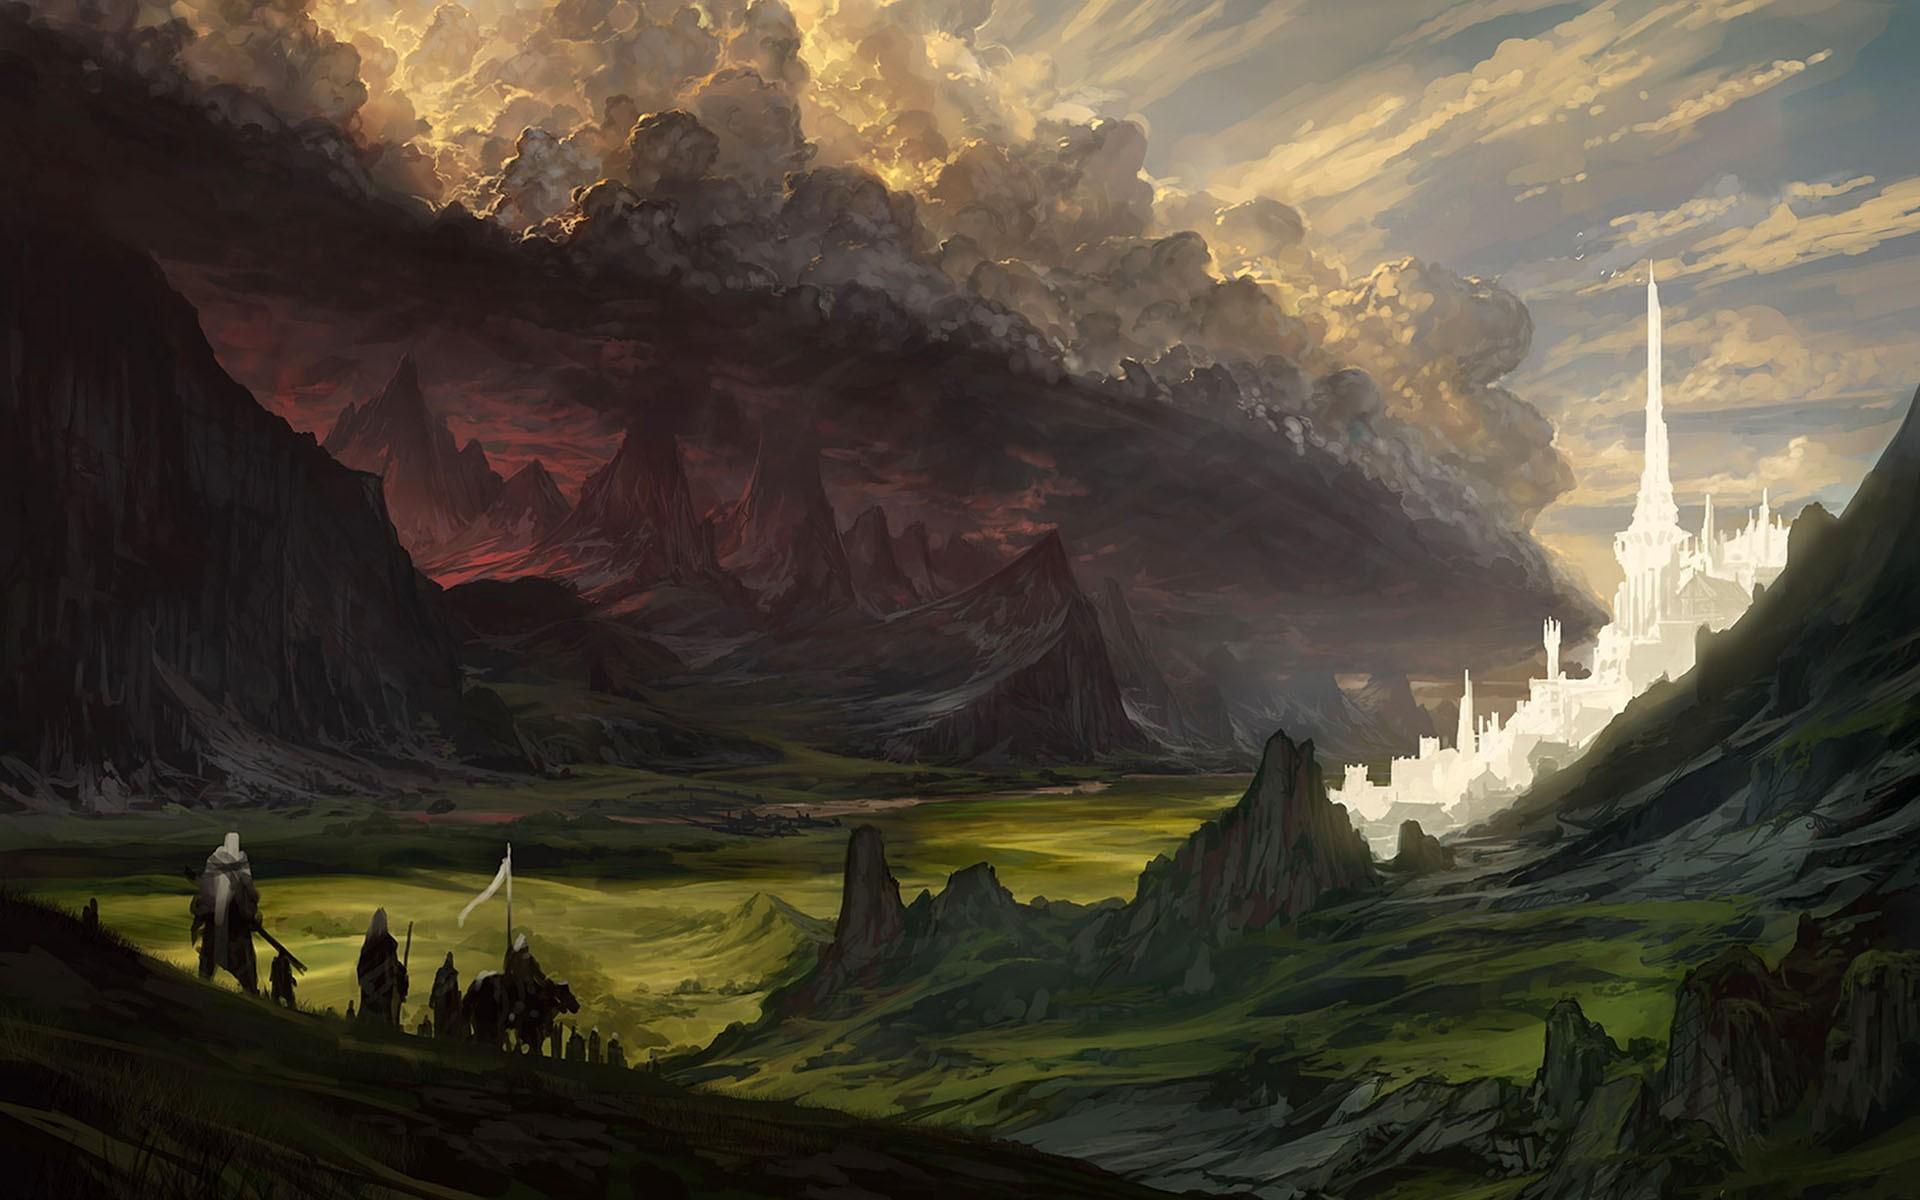 Minas Tirith Wallpaper 62 Images